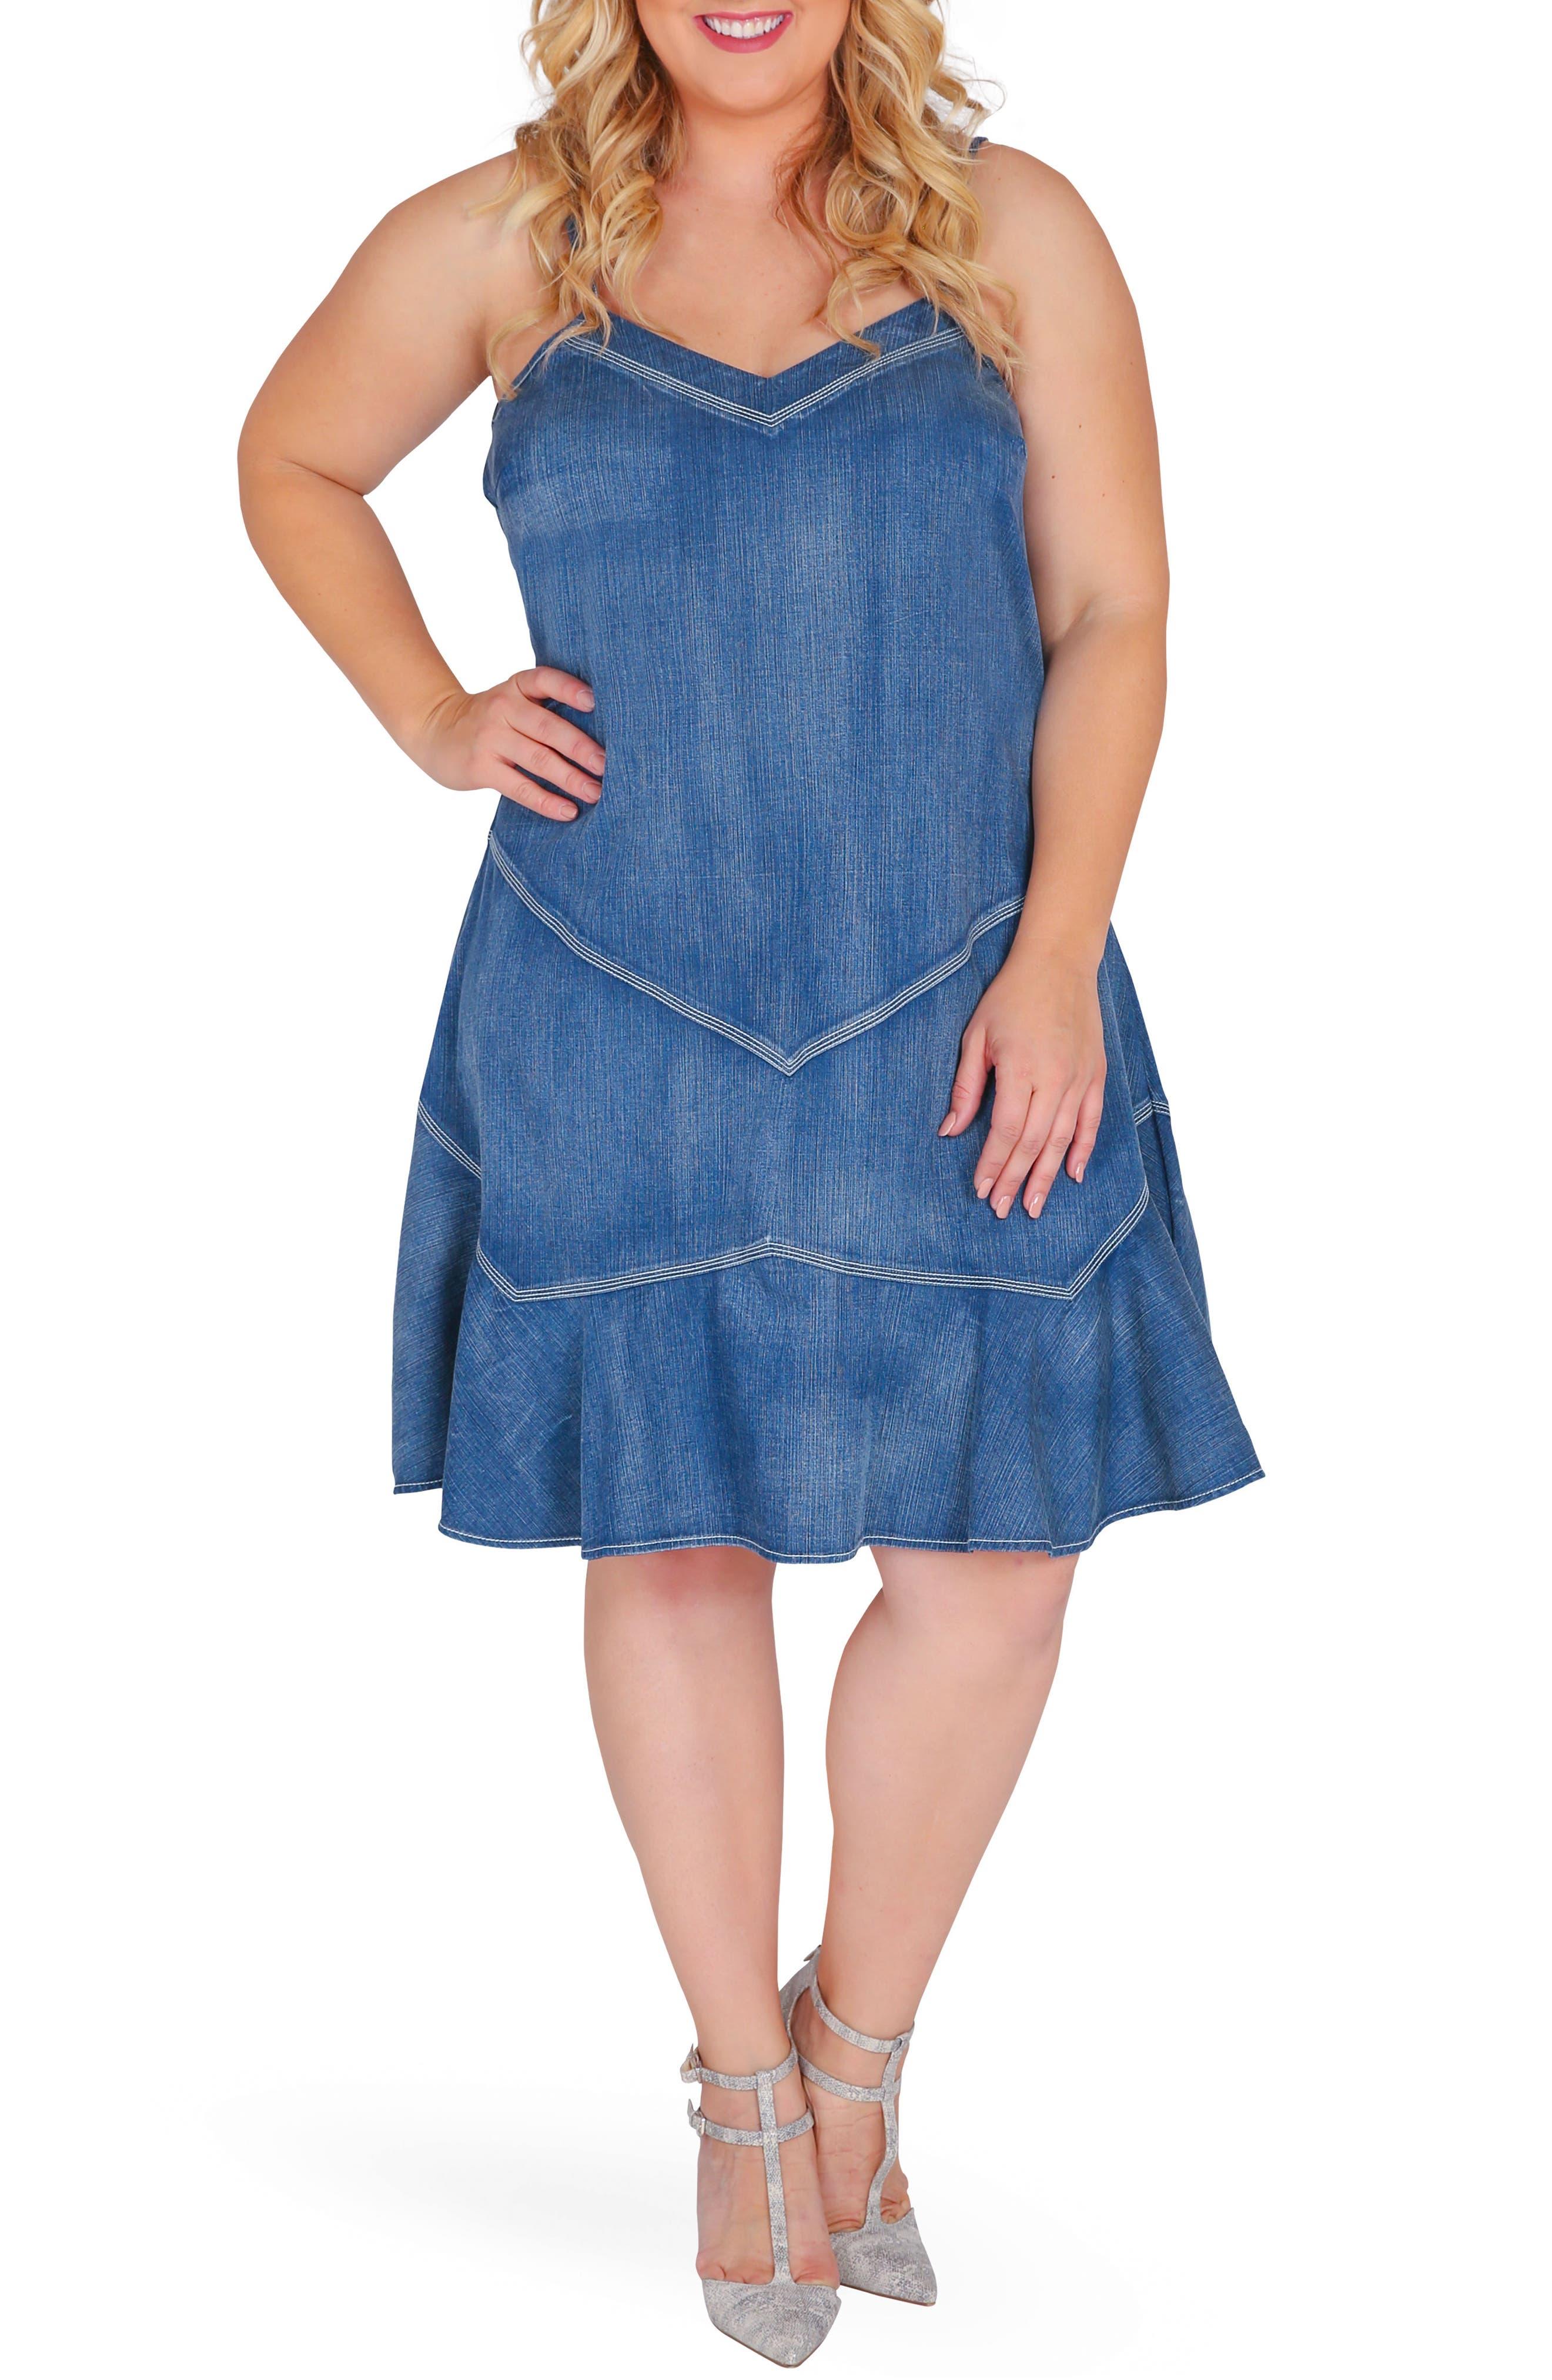 Standards & Practices Rosie Denim Tank Dress (Plus Size)